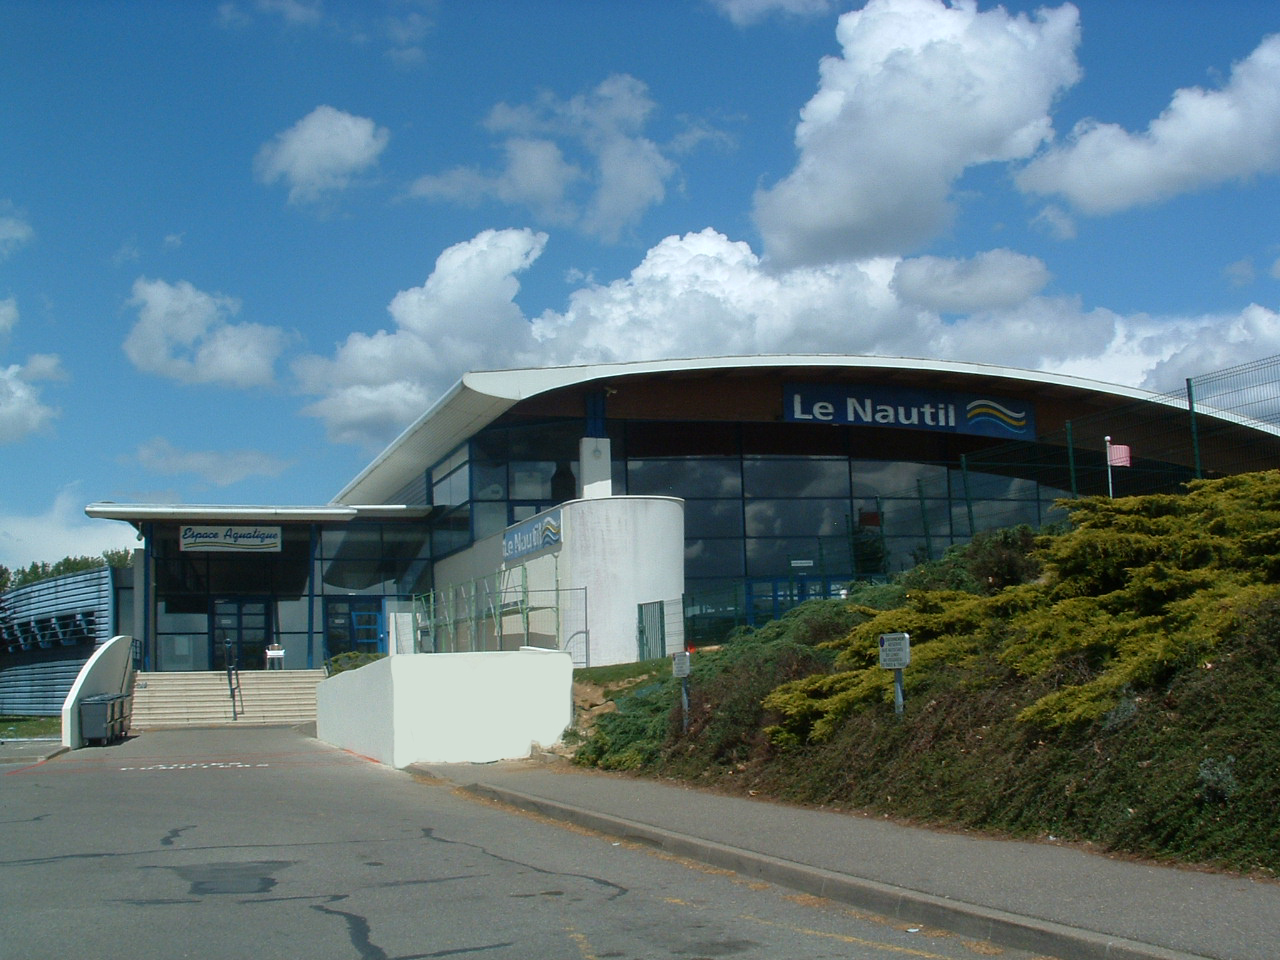 Lenautil